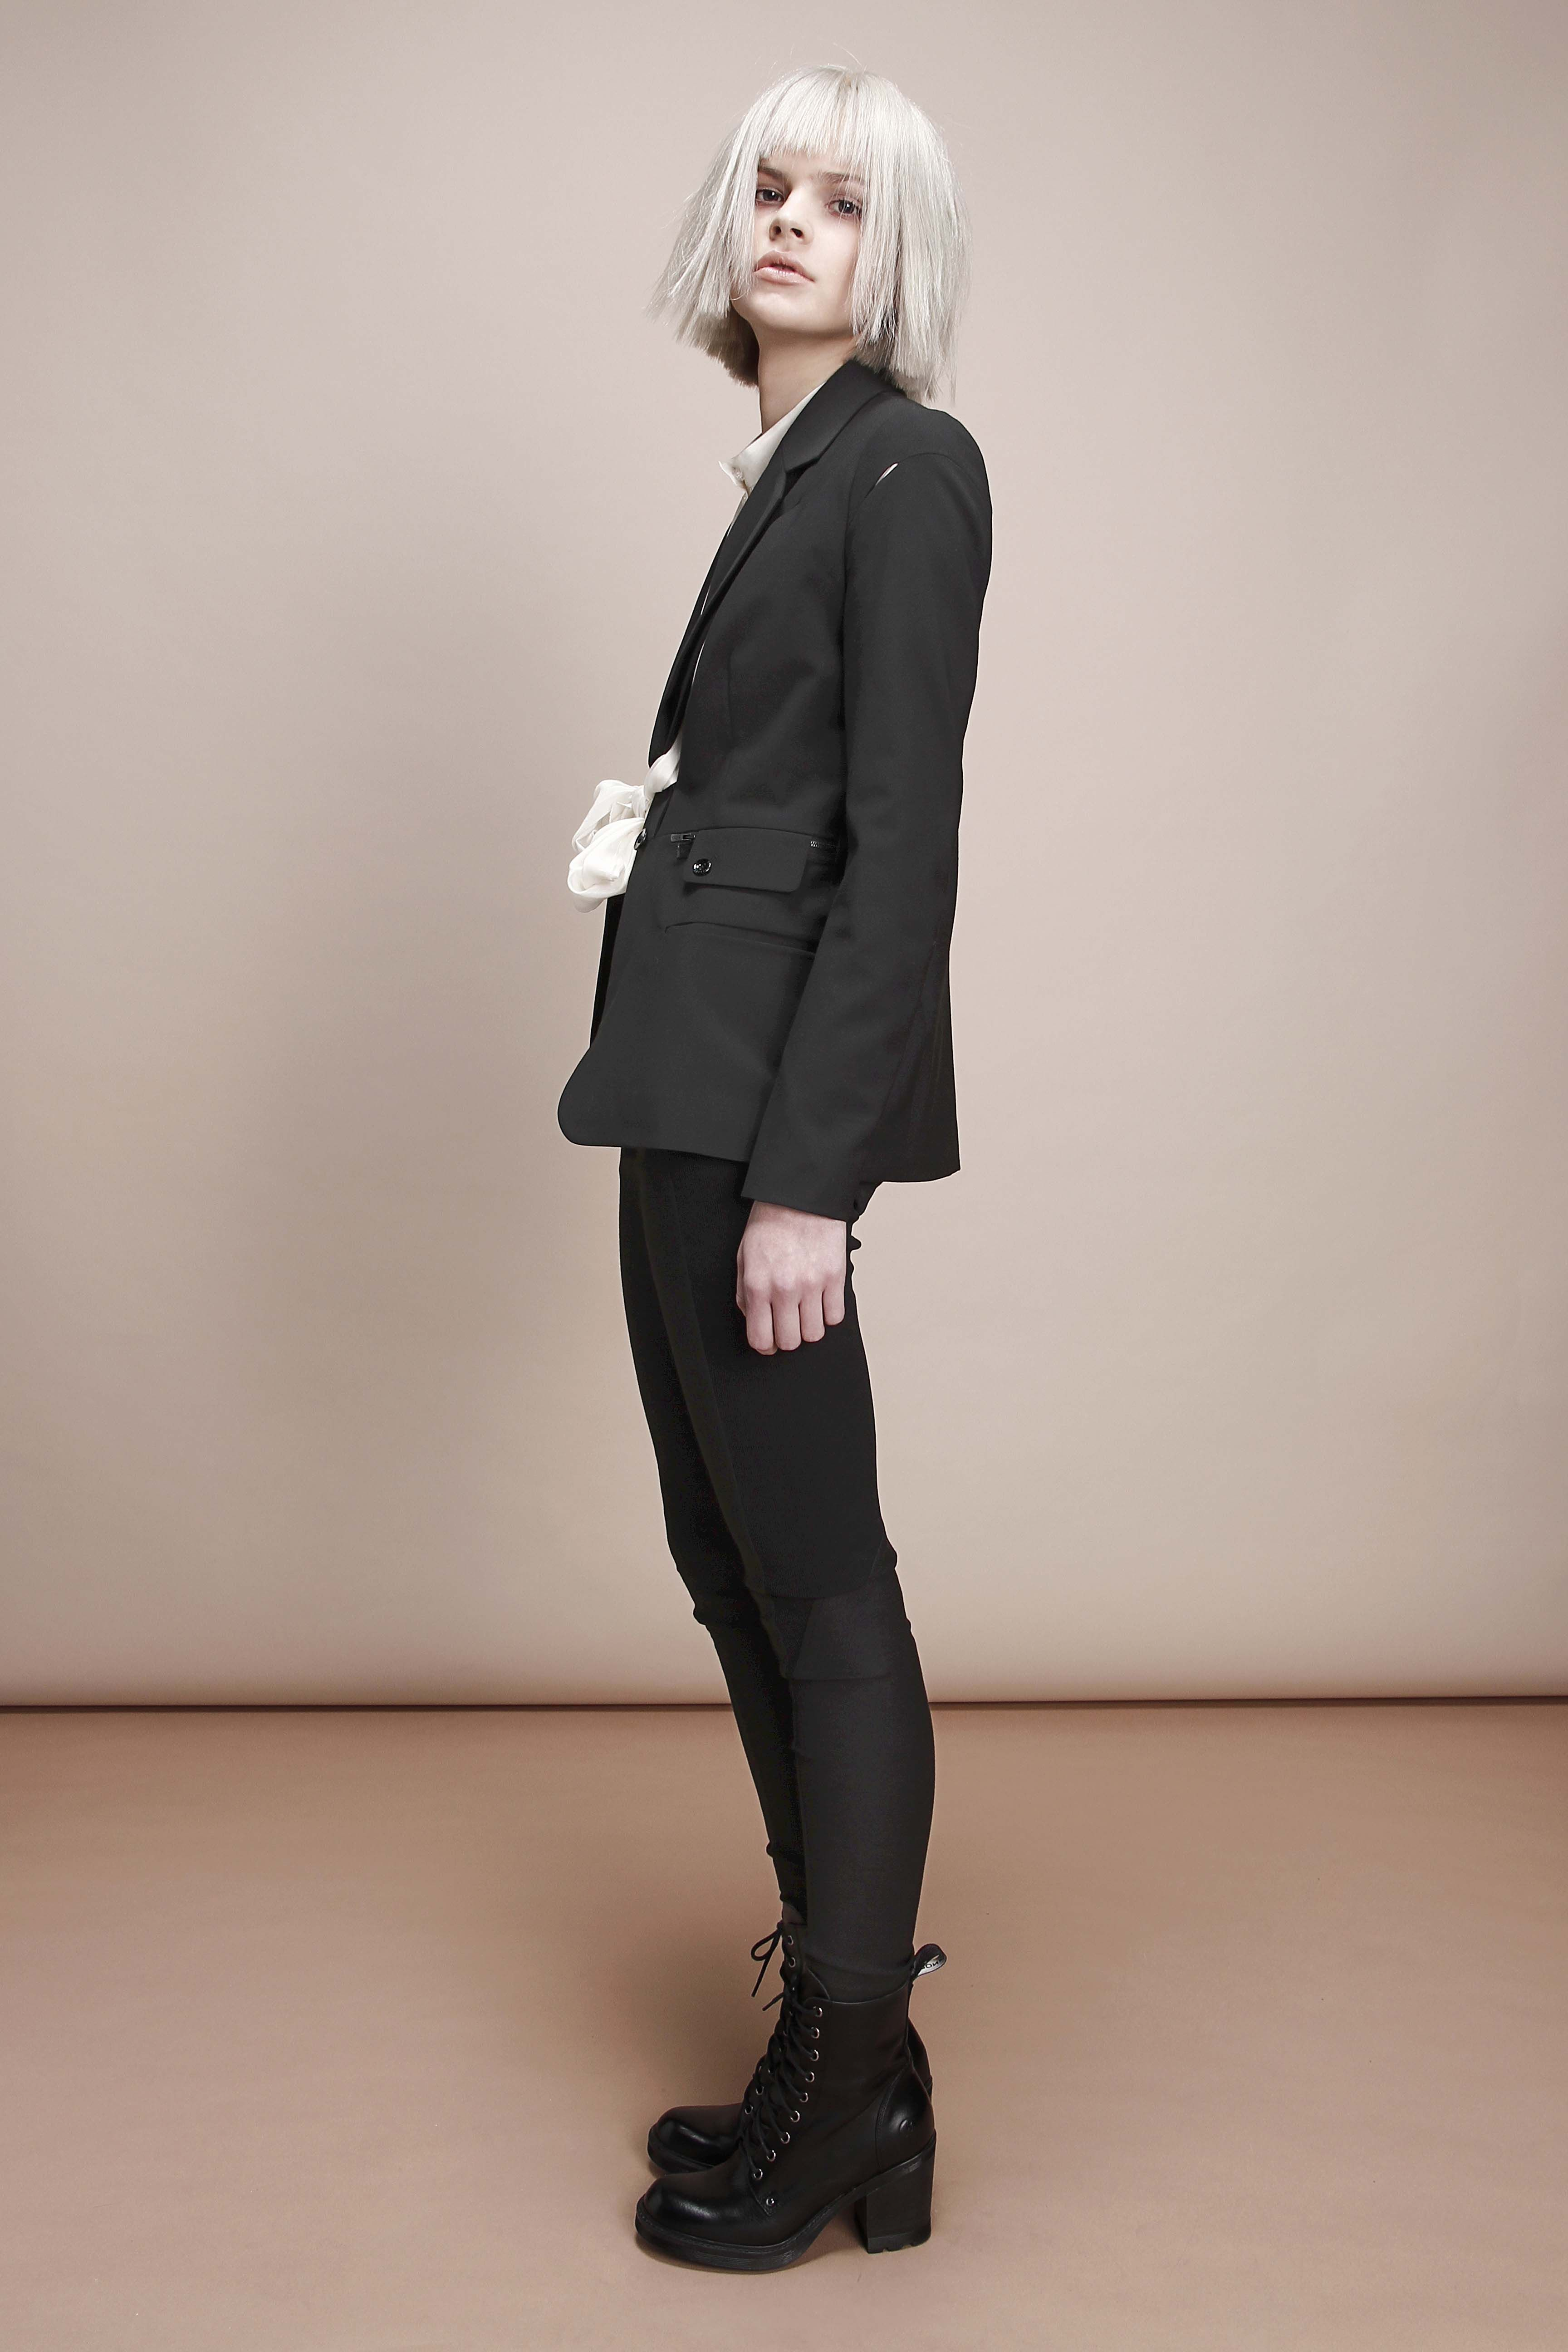 liny blazer /gato skinny / morie shirt